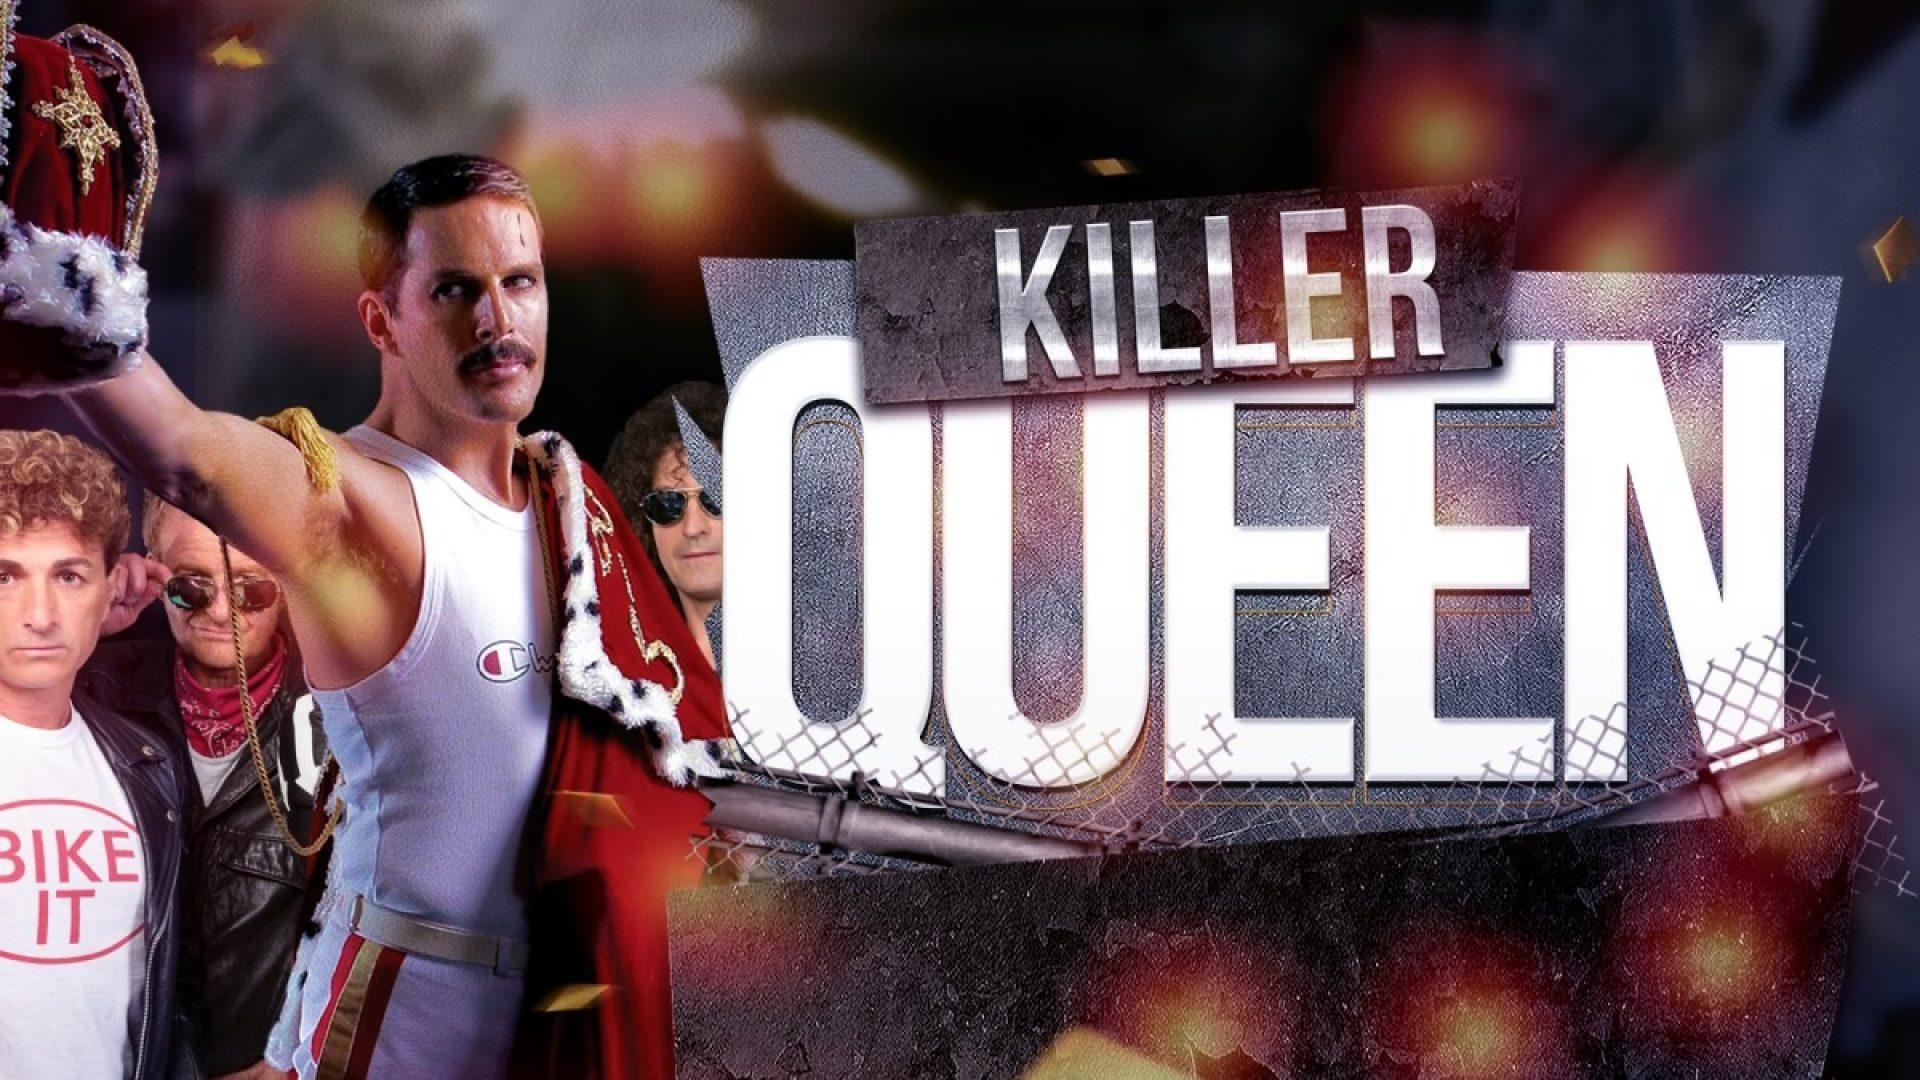 North Lakes Sports Club Killer Queen - North Lakes Sports Club